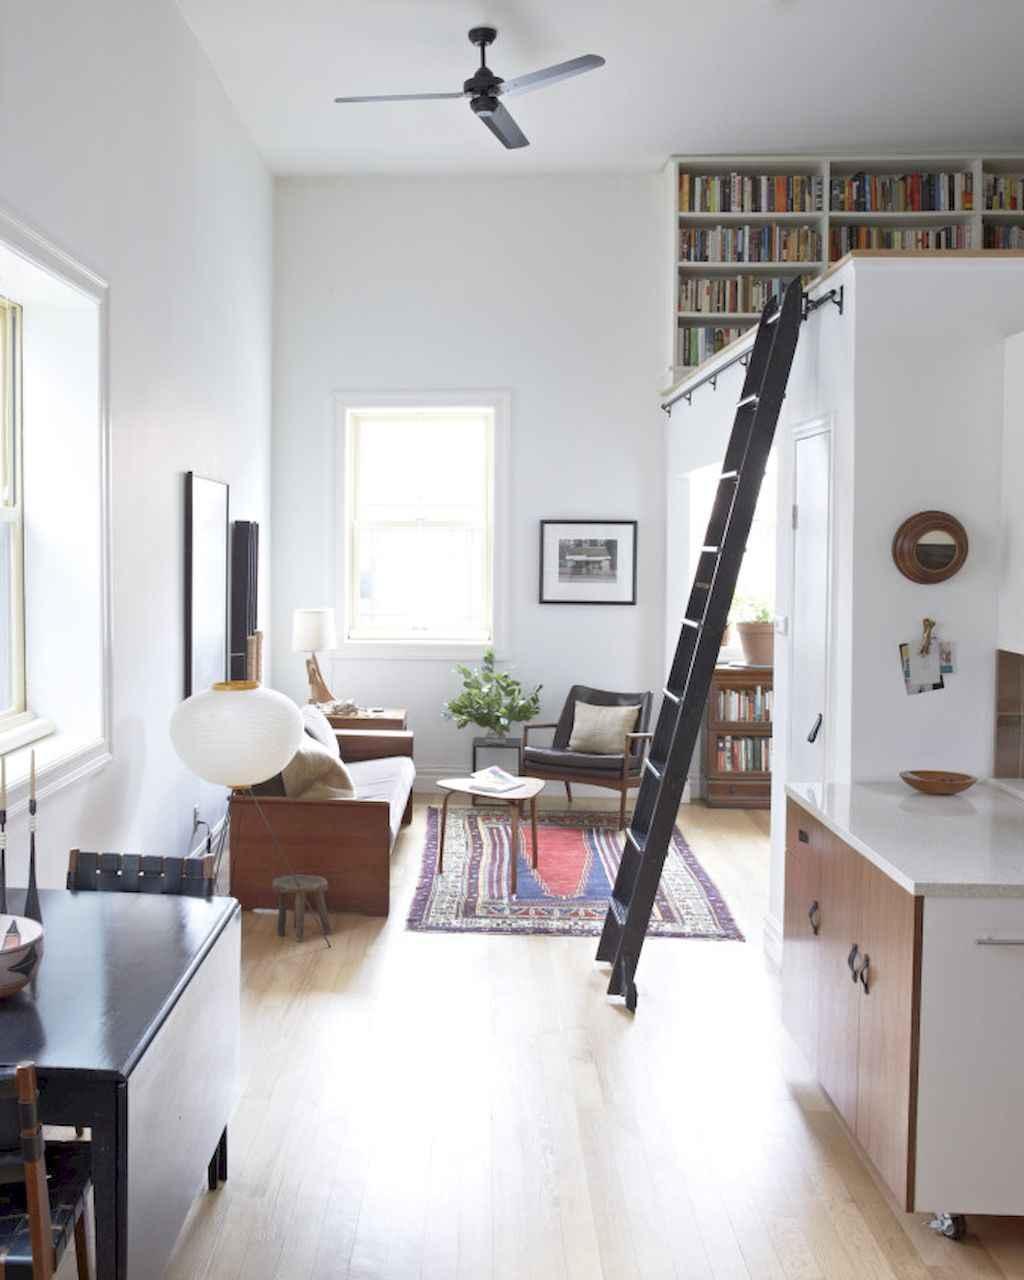 Cool creative loft apartment decorating ideas (2)